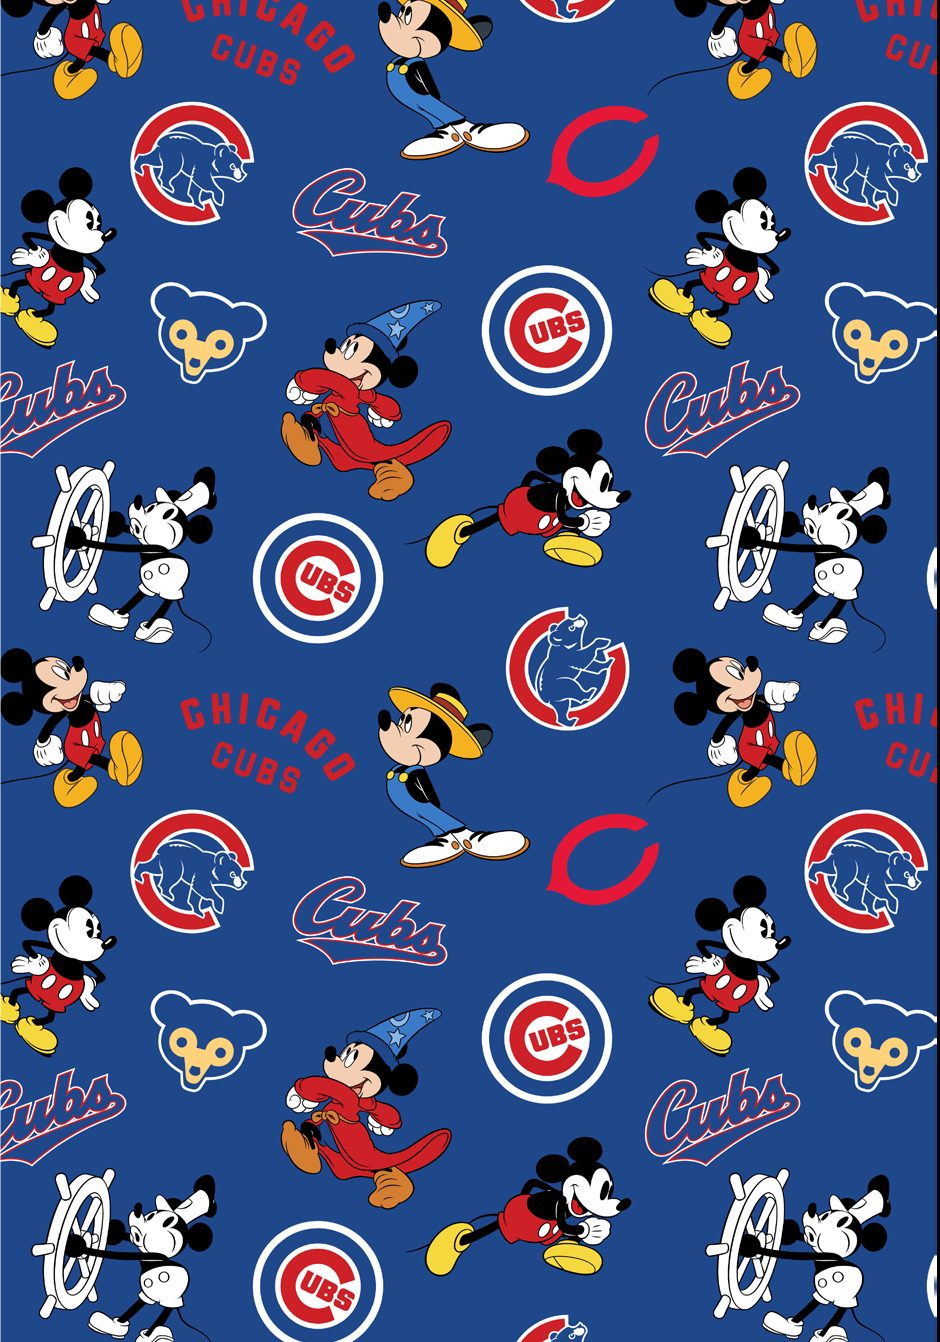 PROMO* FT-MLB Disney Mash-UP 60282-B Chicago Cubs